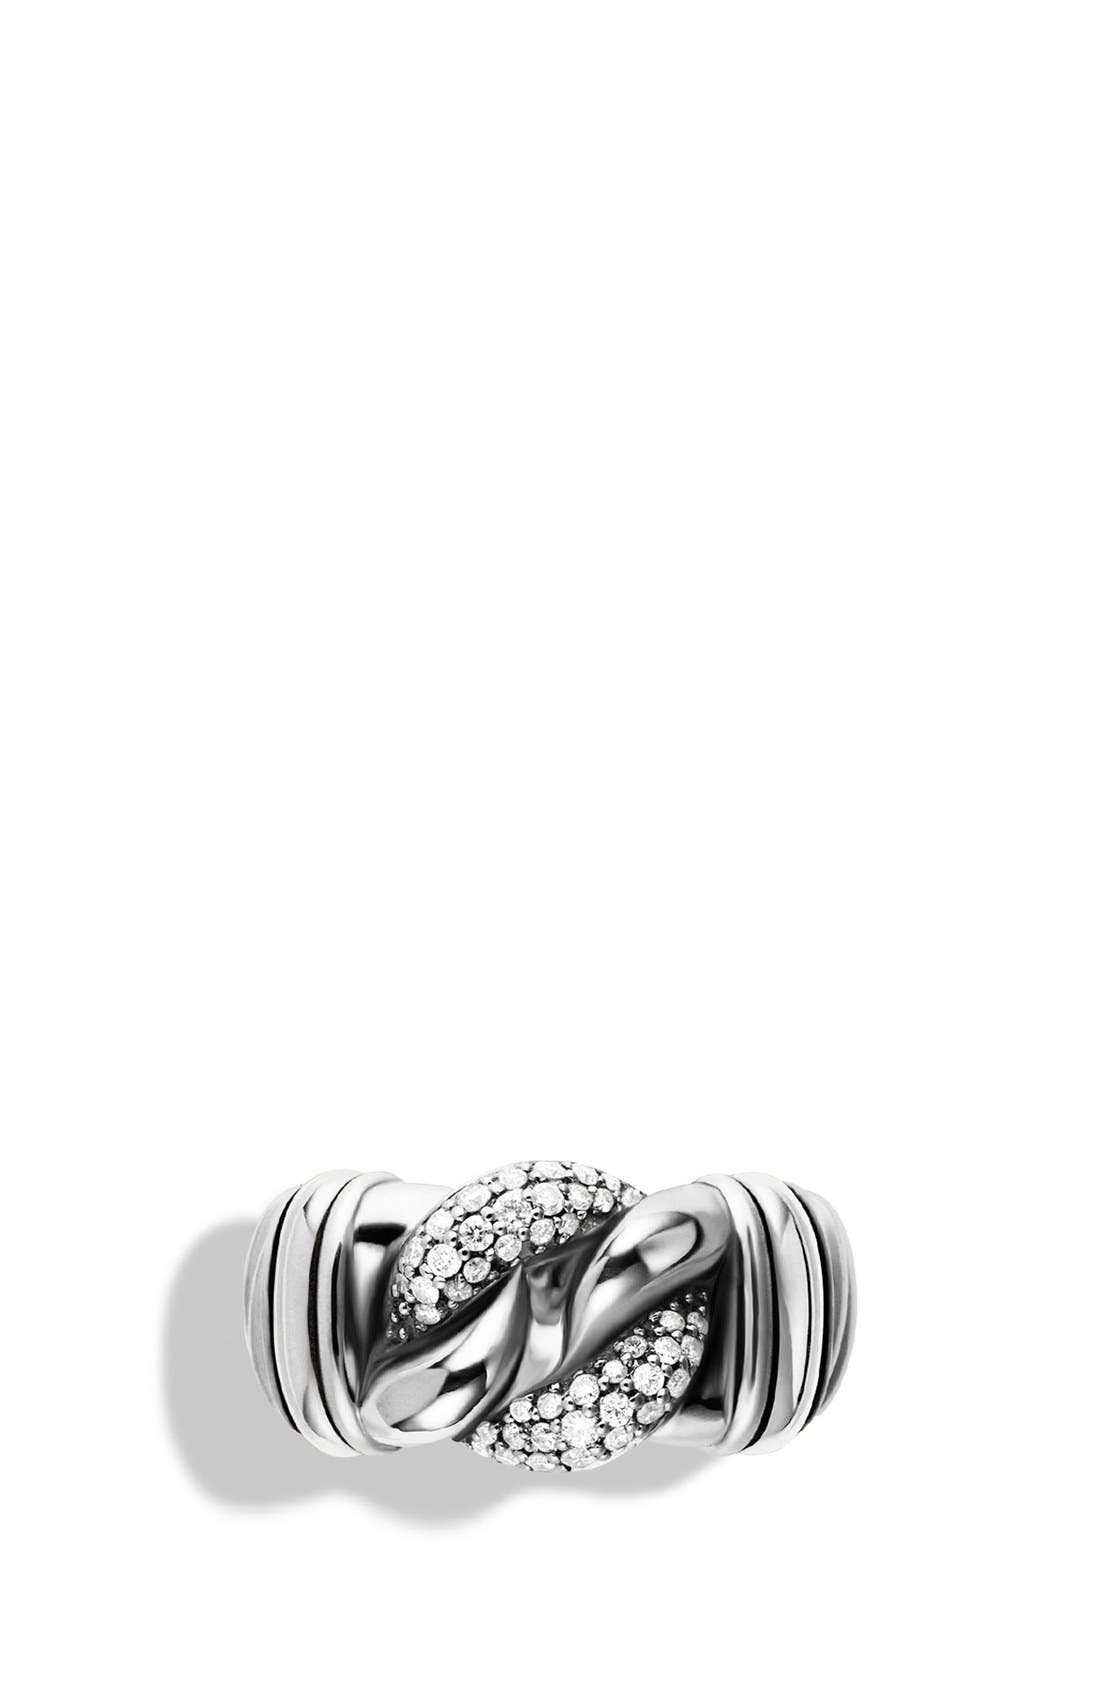 Alternate Image 3  - David Yurman 'Metro' Curb Wide Ring with Diamonds